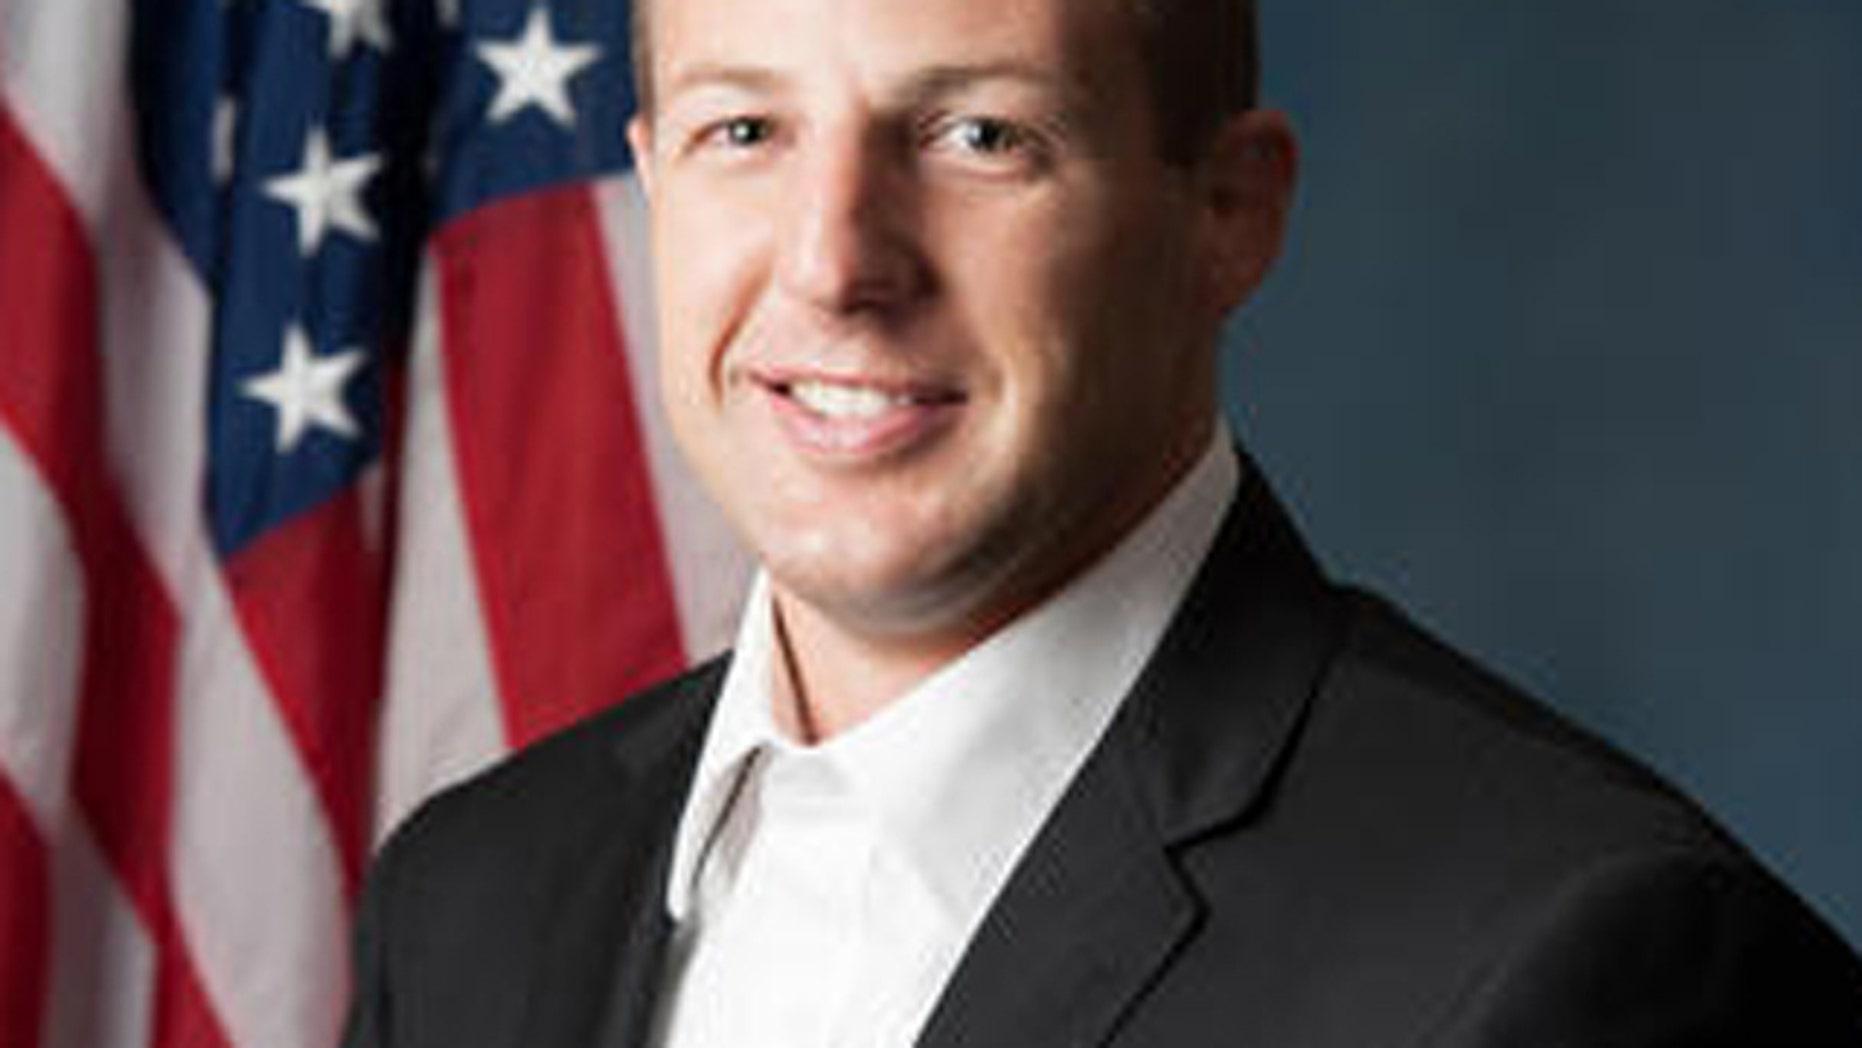 Rep. Markwayne Mullin of Oklahoma.